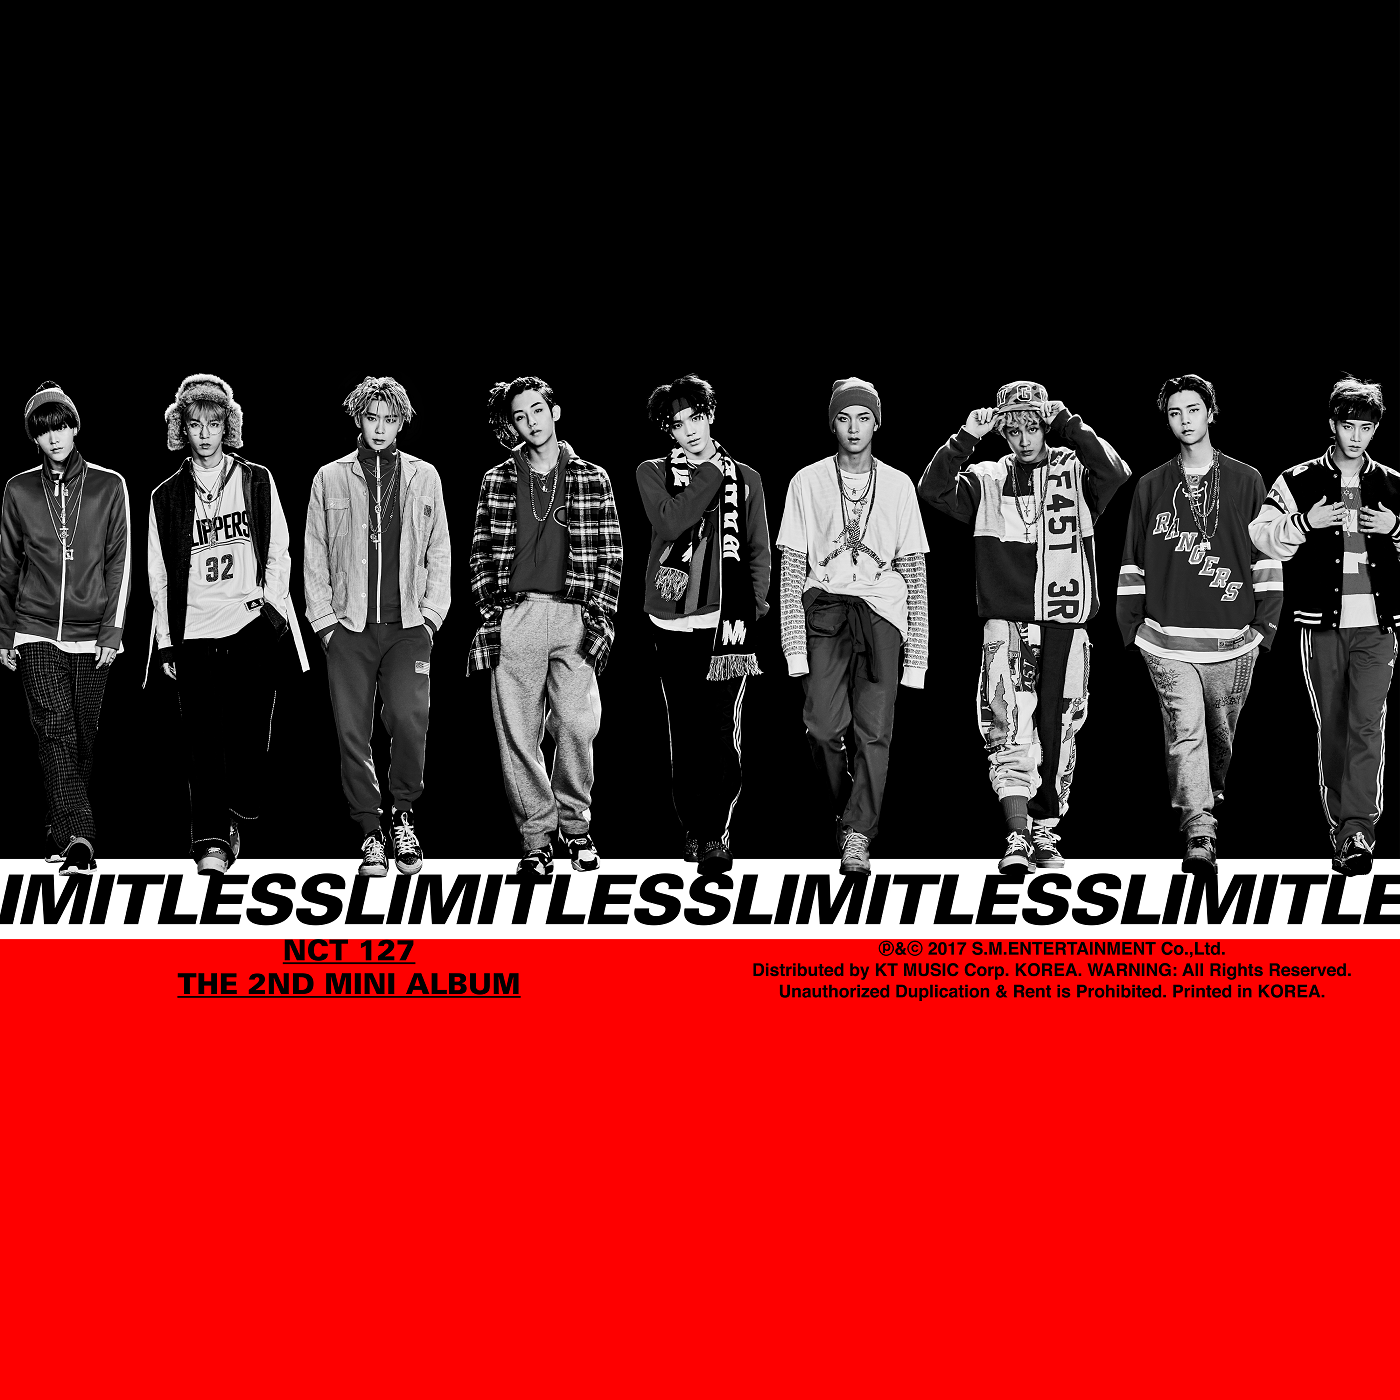 Nct 127 2nd mini album limitless